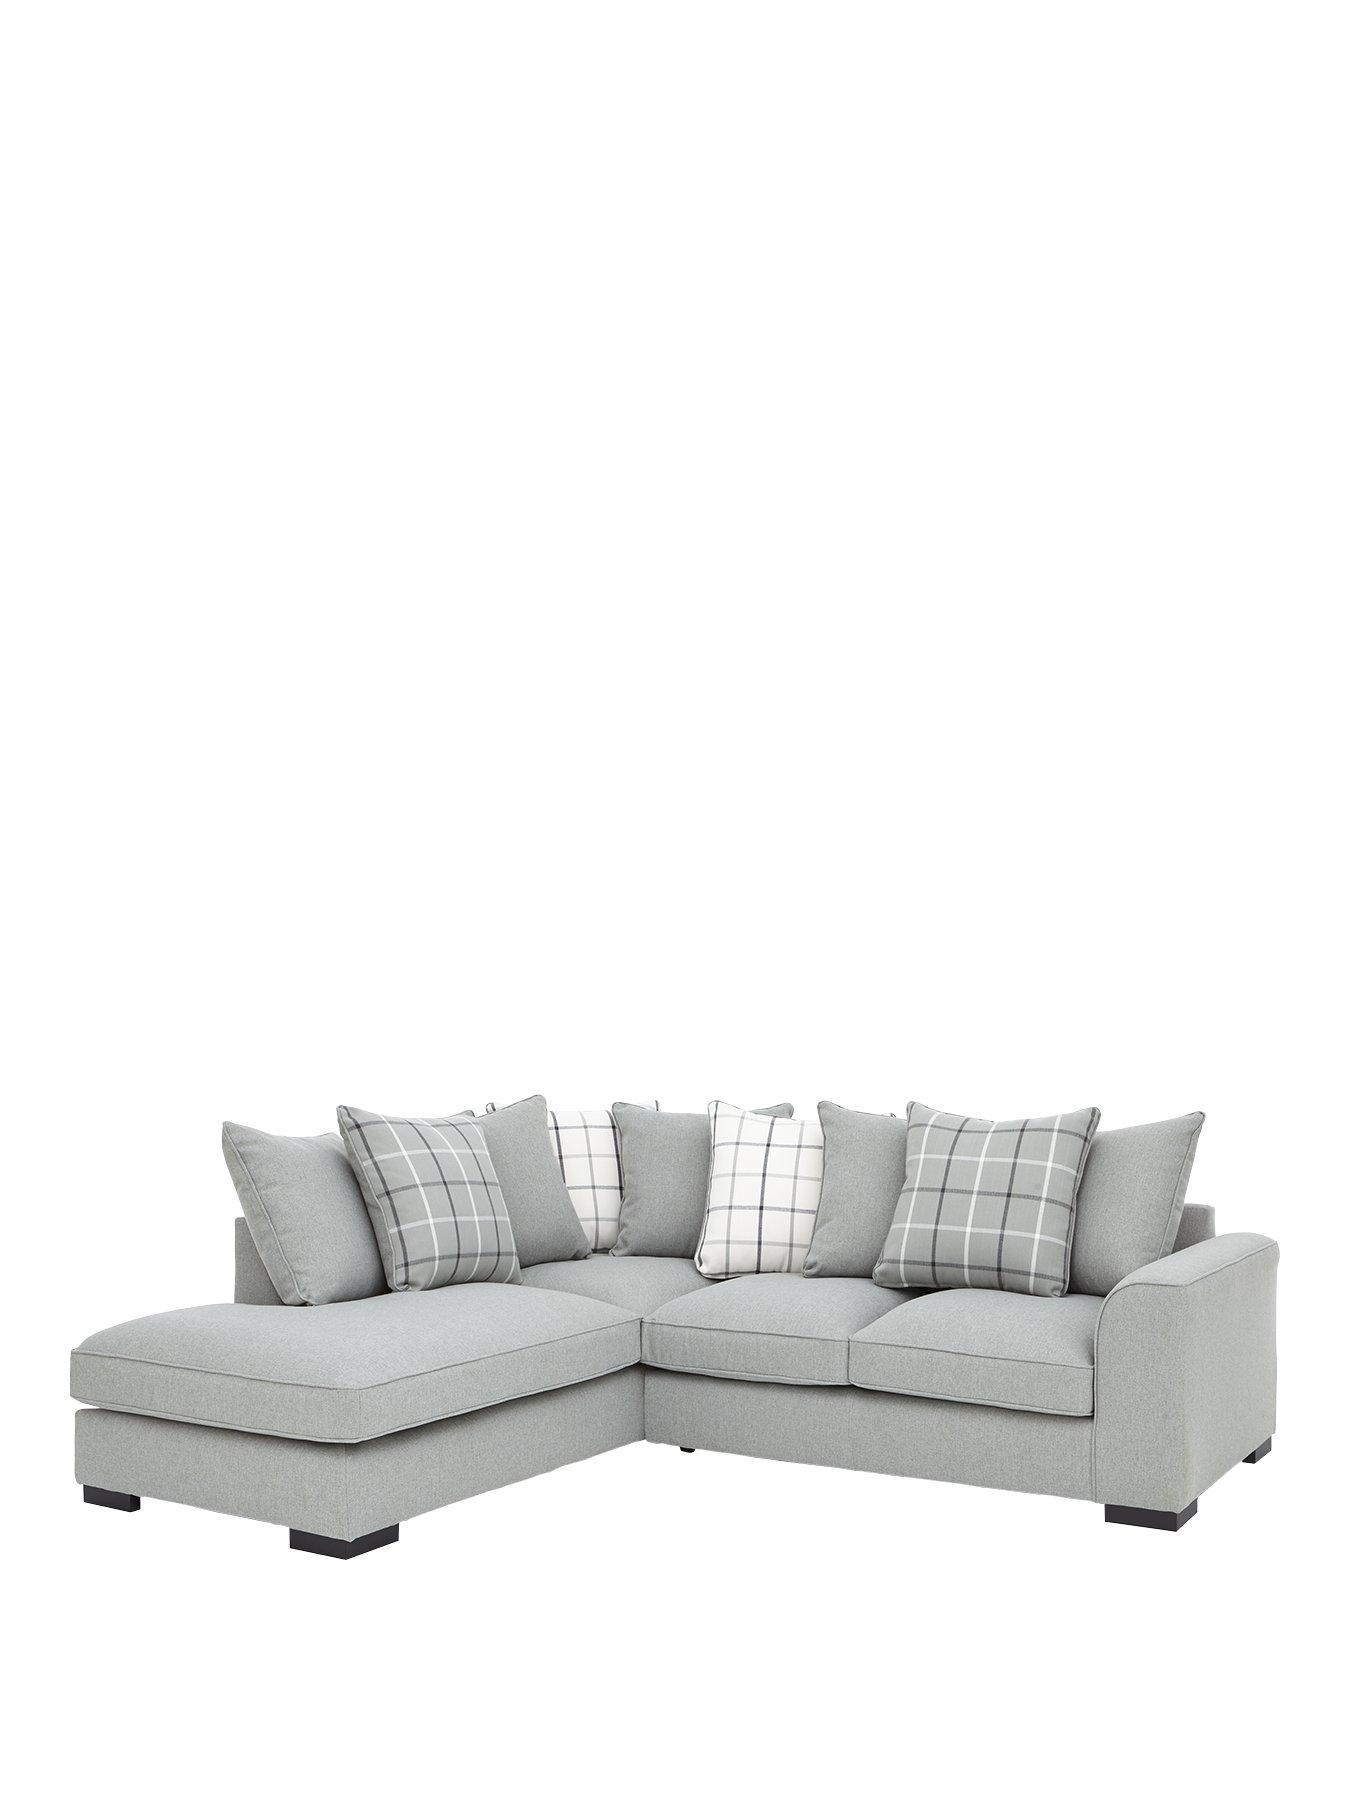 ideal home croft lefthand fabric corner chaise sofa